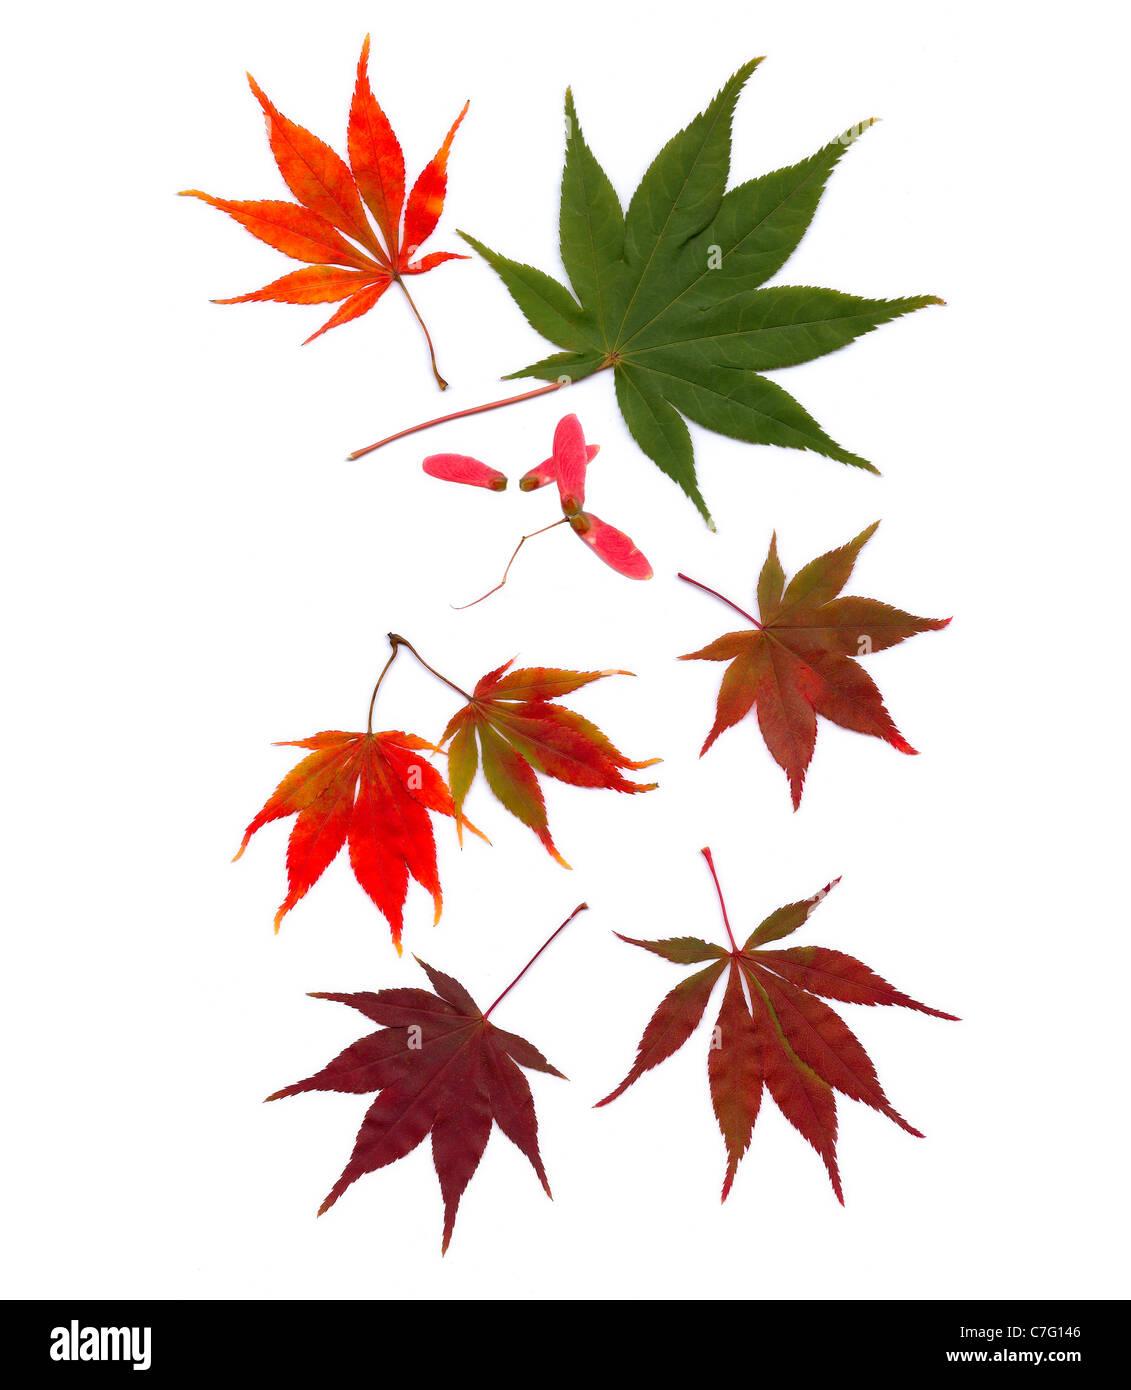 japanische ahorn bl tter blatt acer palmatum herbst farben. Black Bedroom Furniture Sets. Home Design Ideas